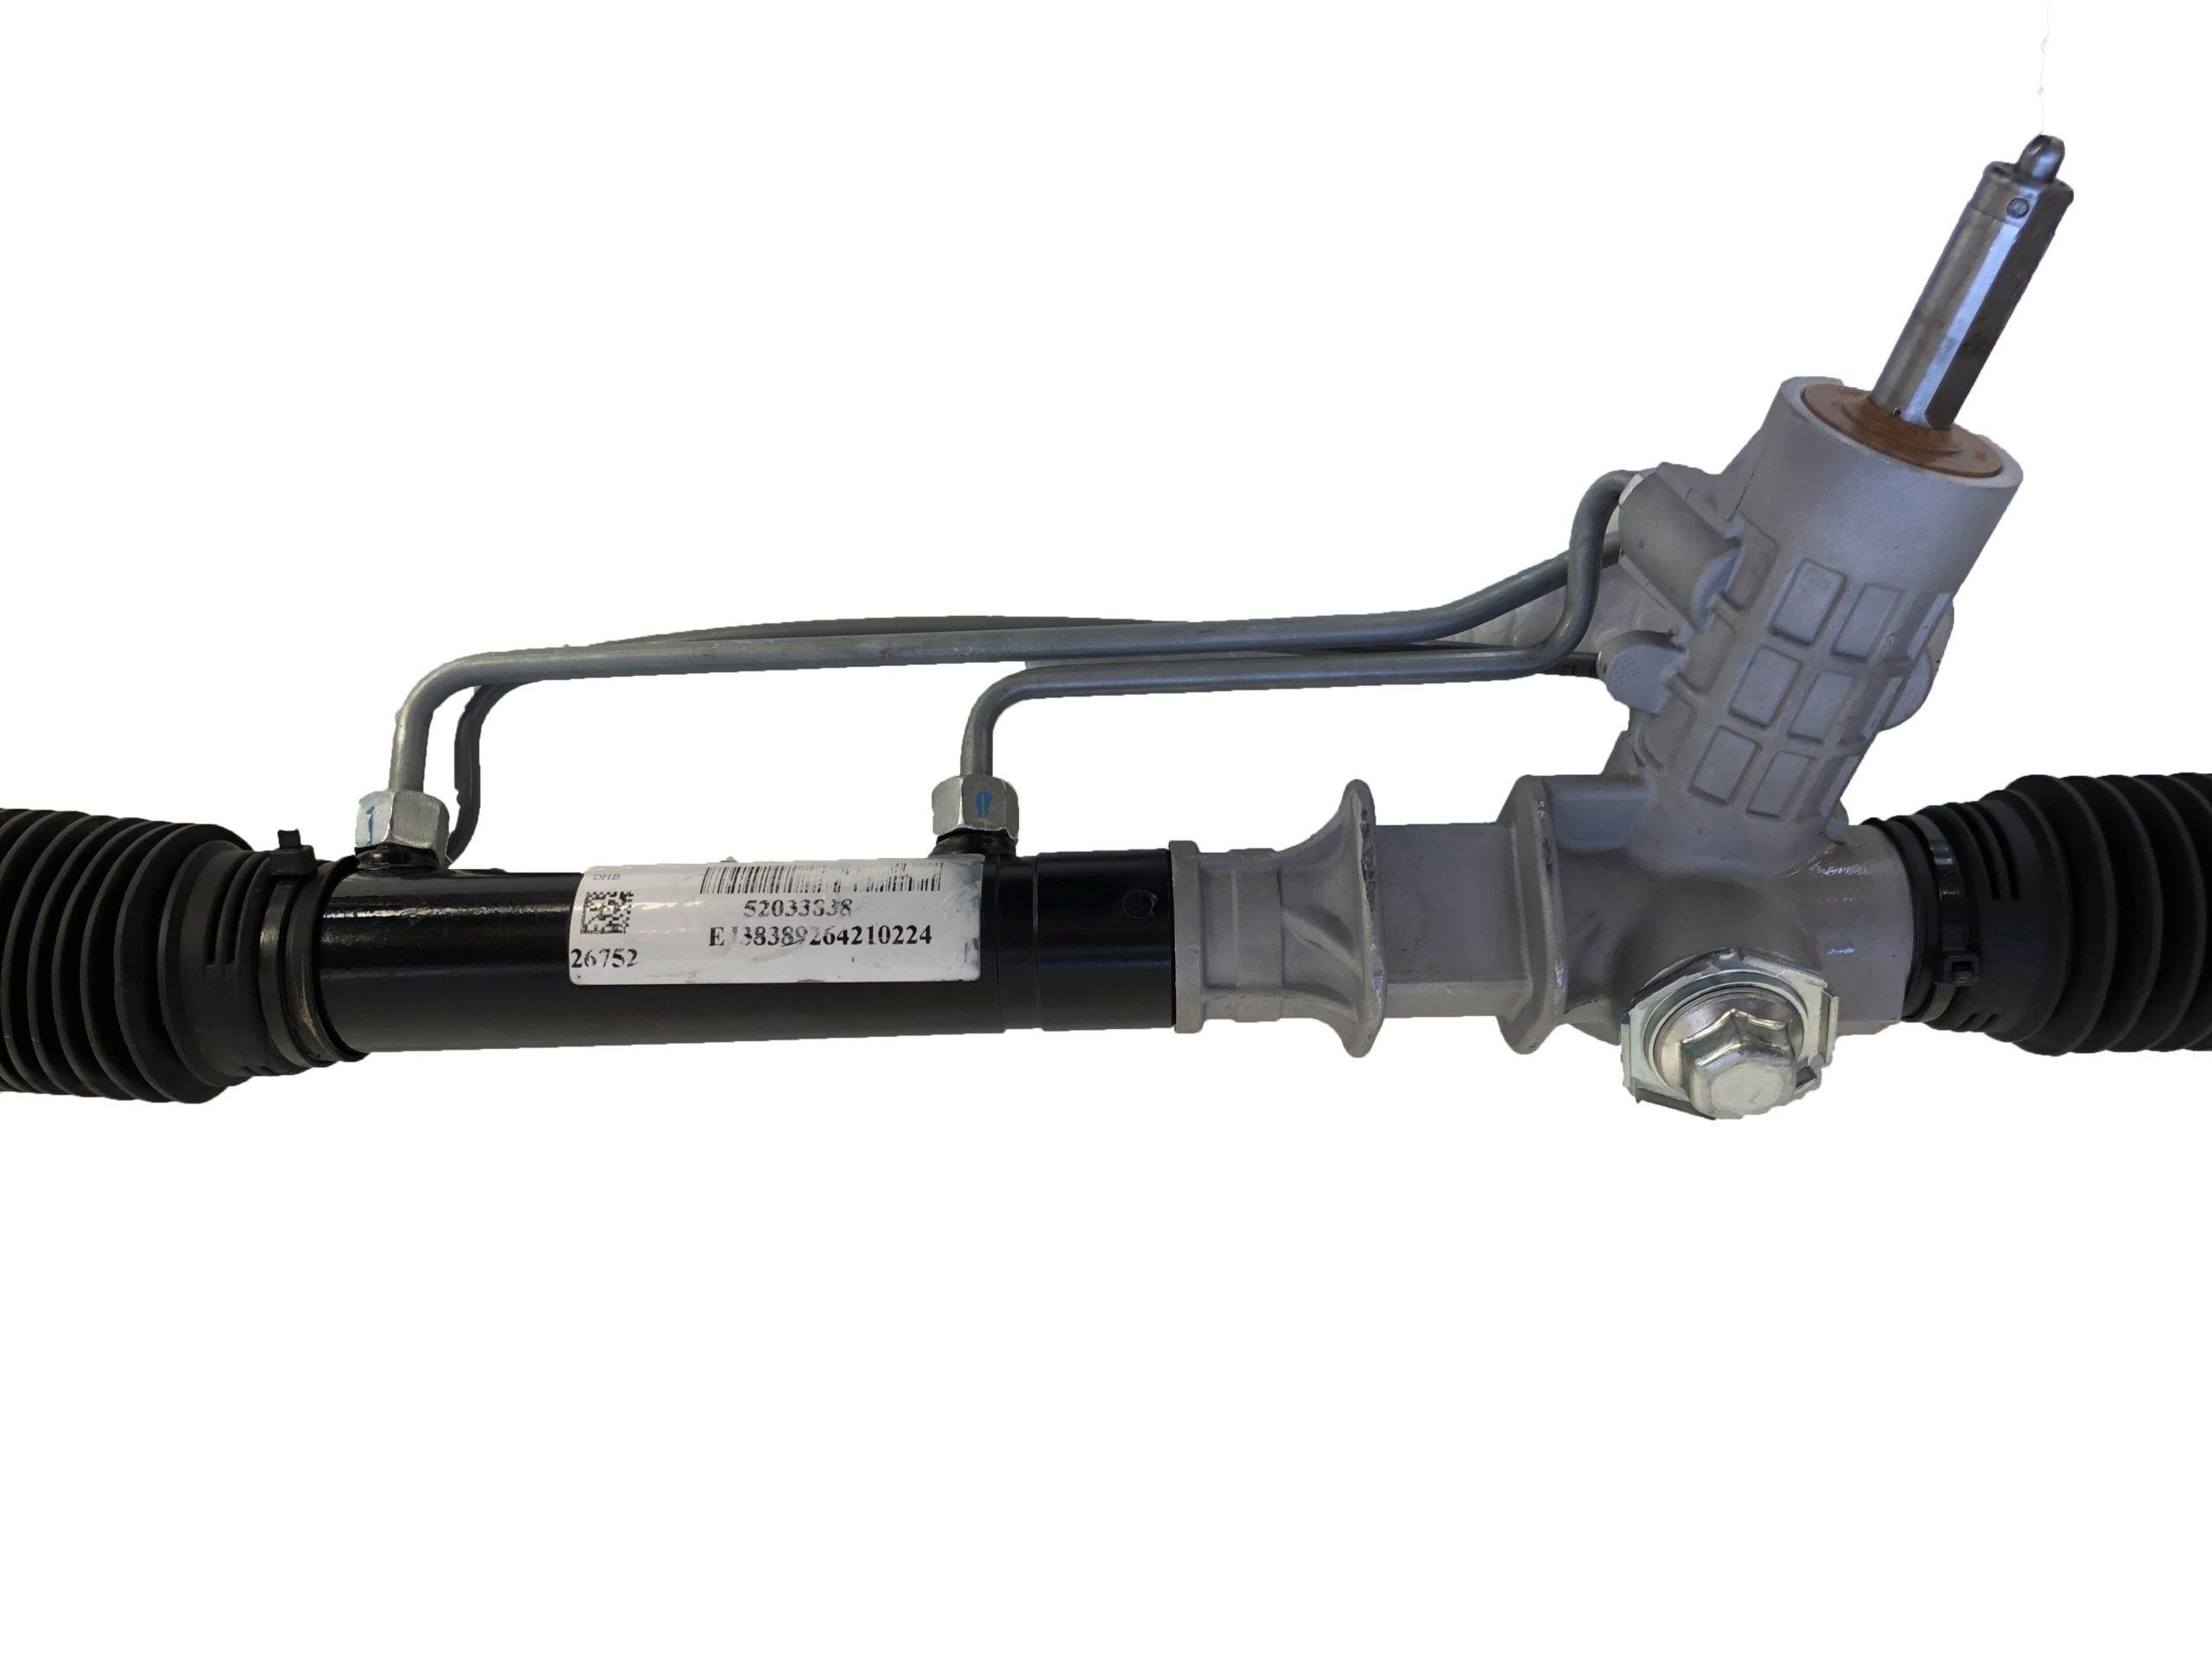 Chev. Utility-OEM Reconditioned Steering Racks